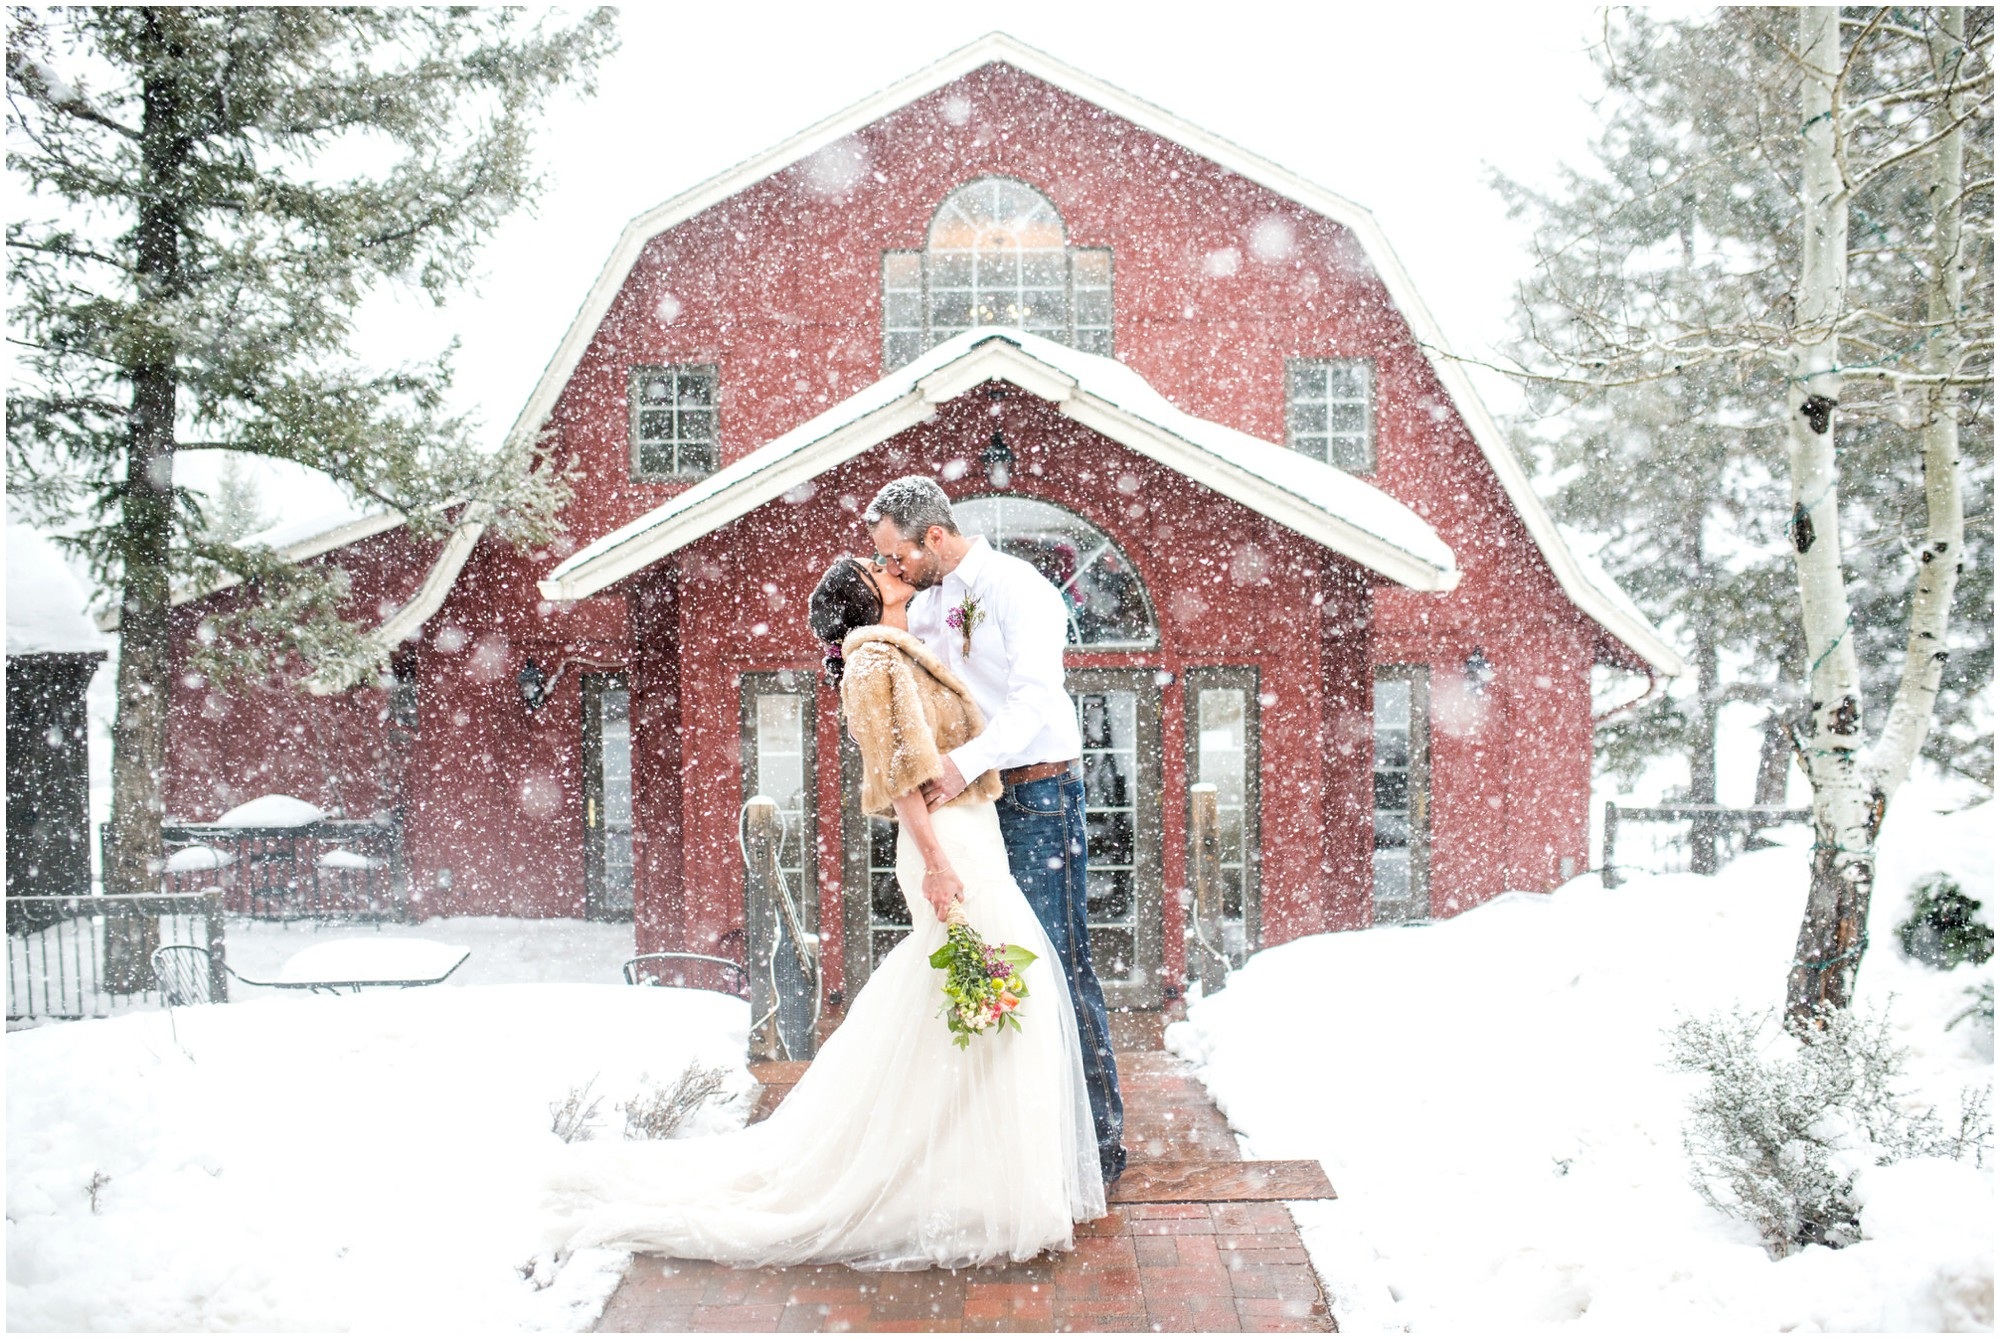 63-evergreen-mountain-winter-wedding-photography.jpg